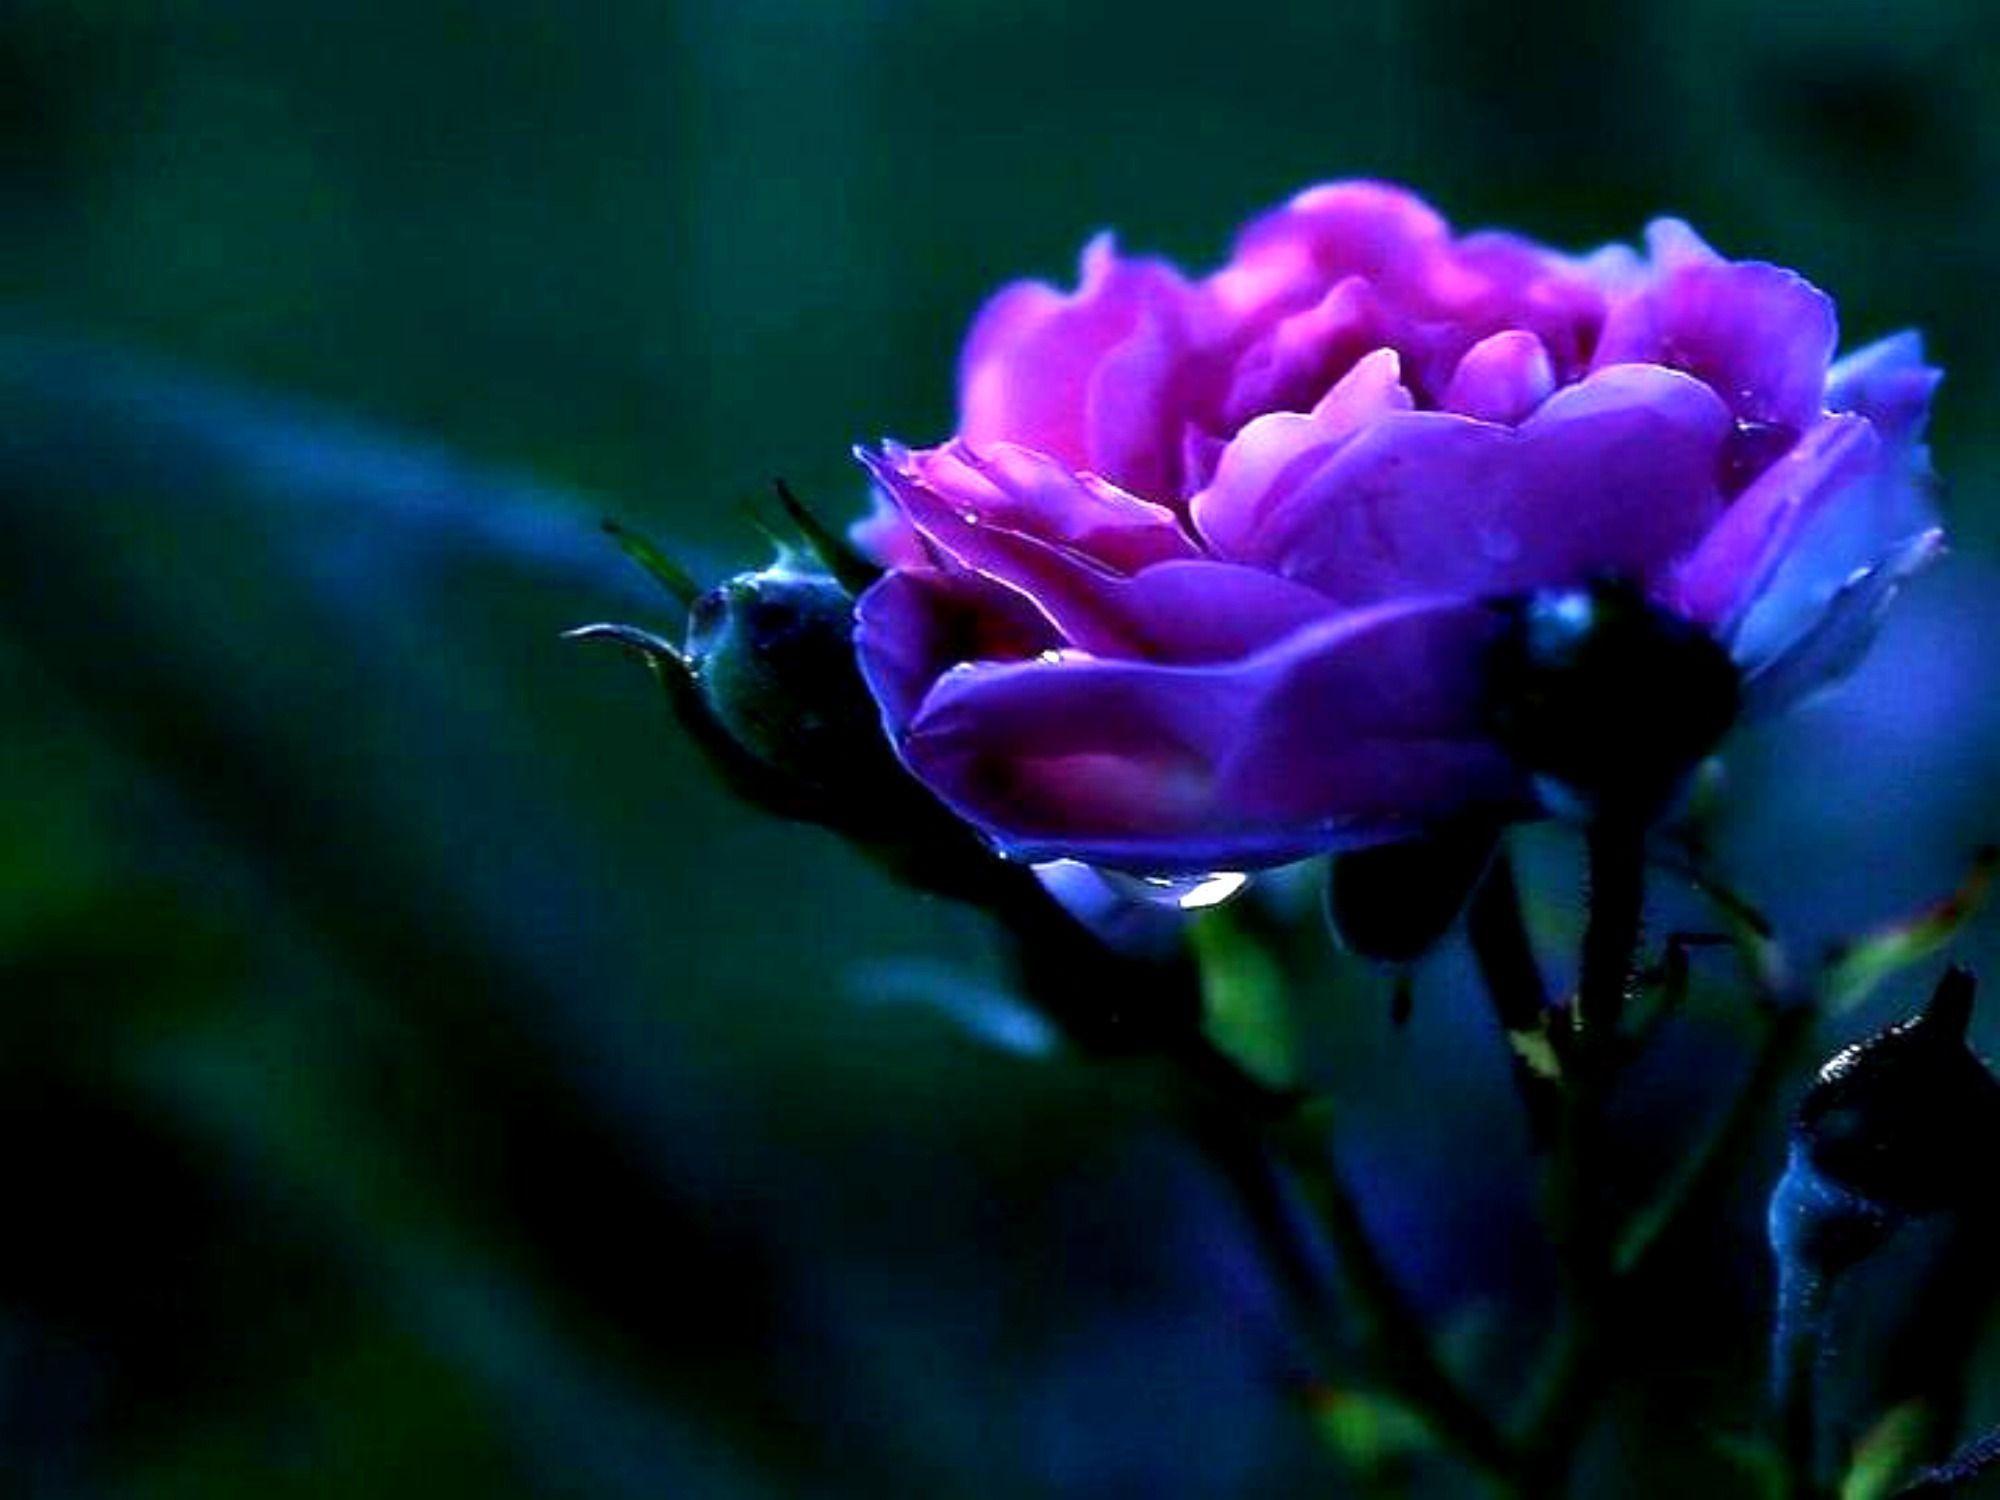 2000x1500 Violet Rose hình nền